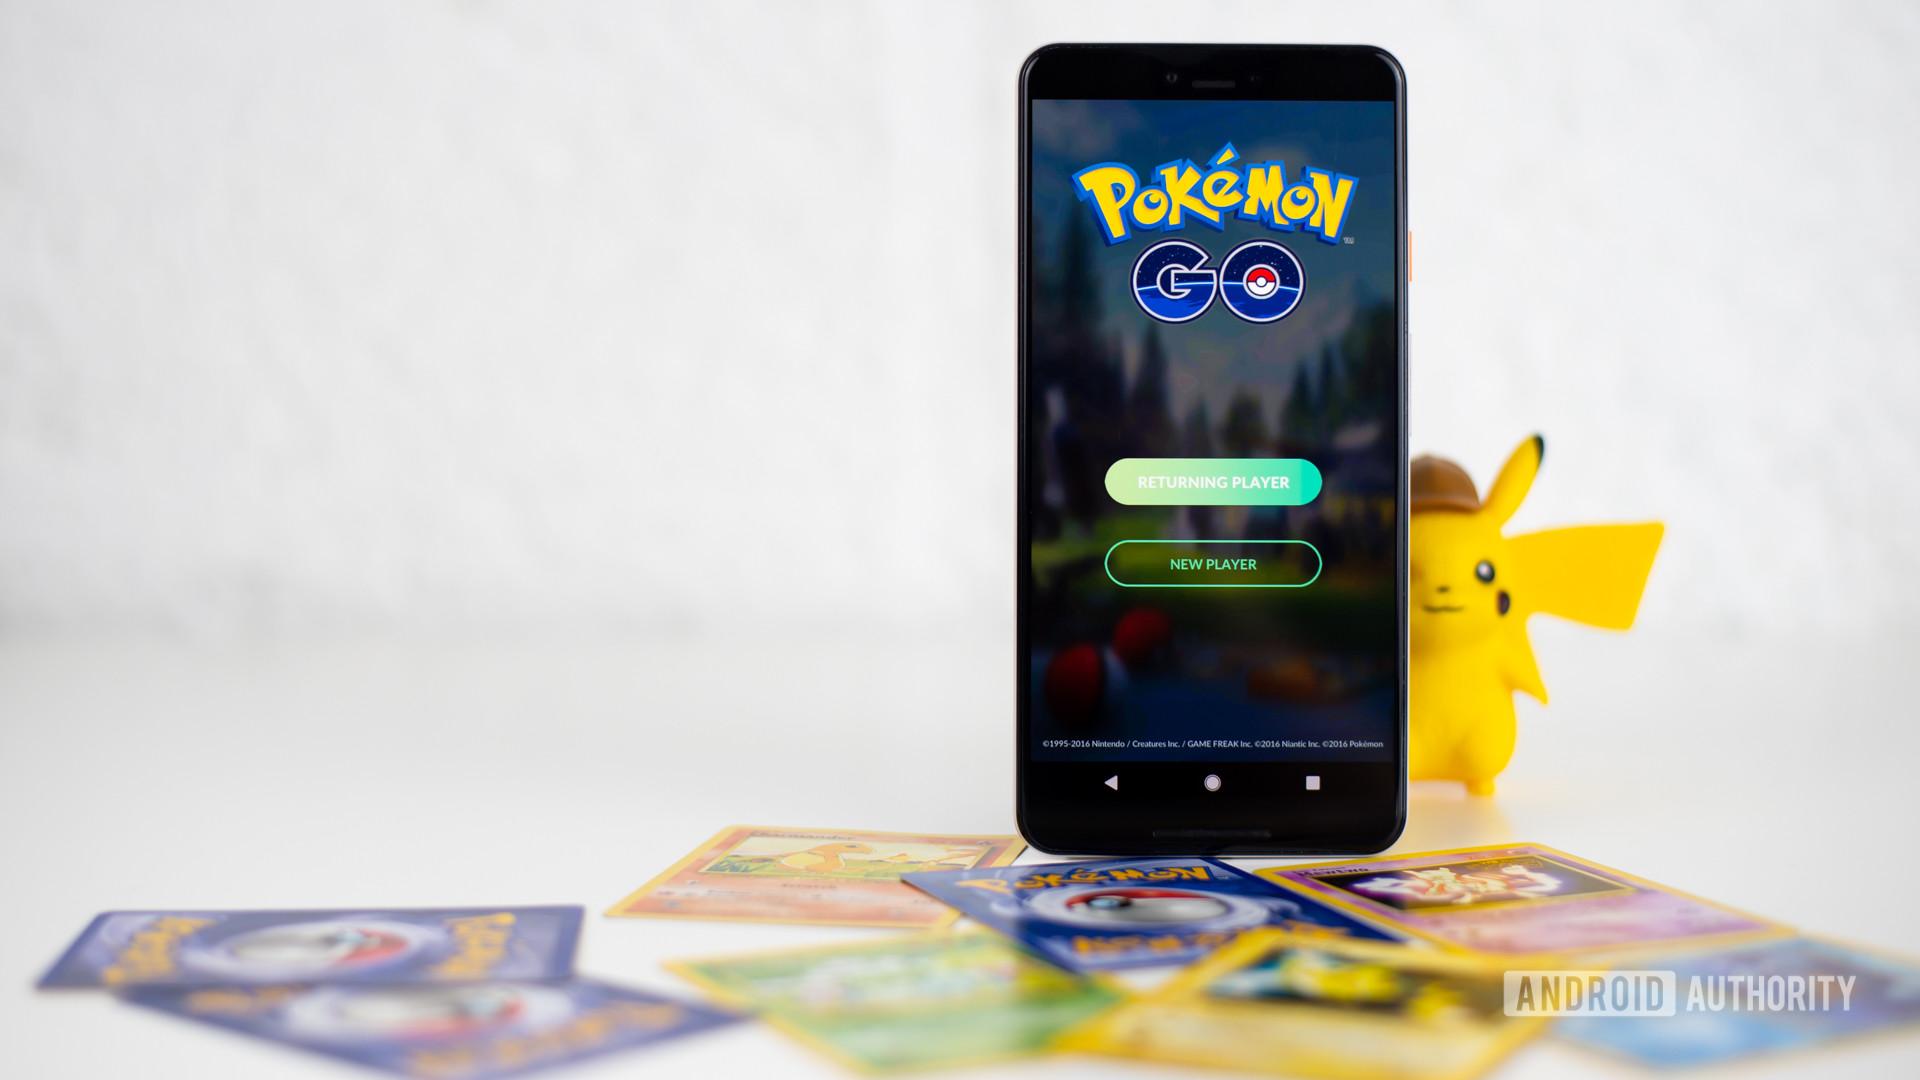 Pokemon Go stock photo 7